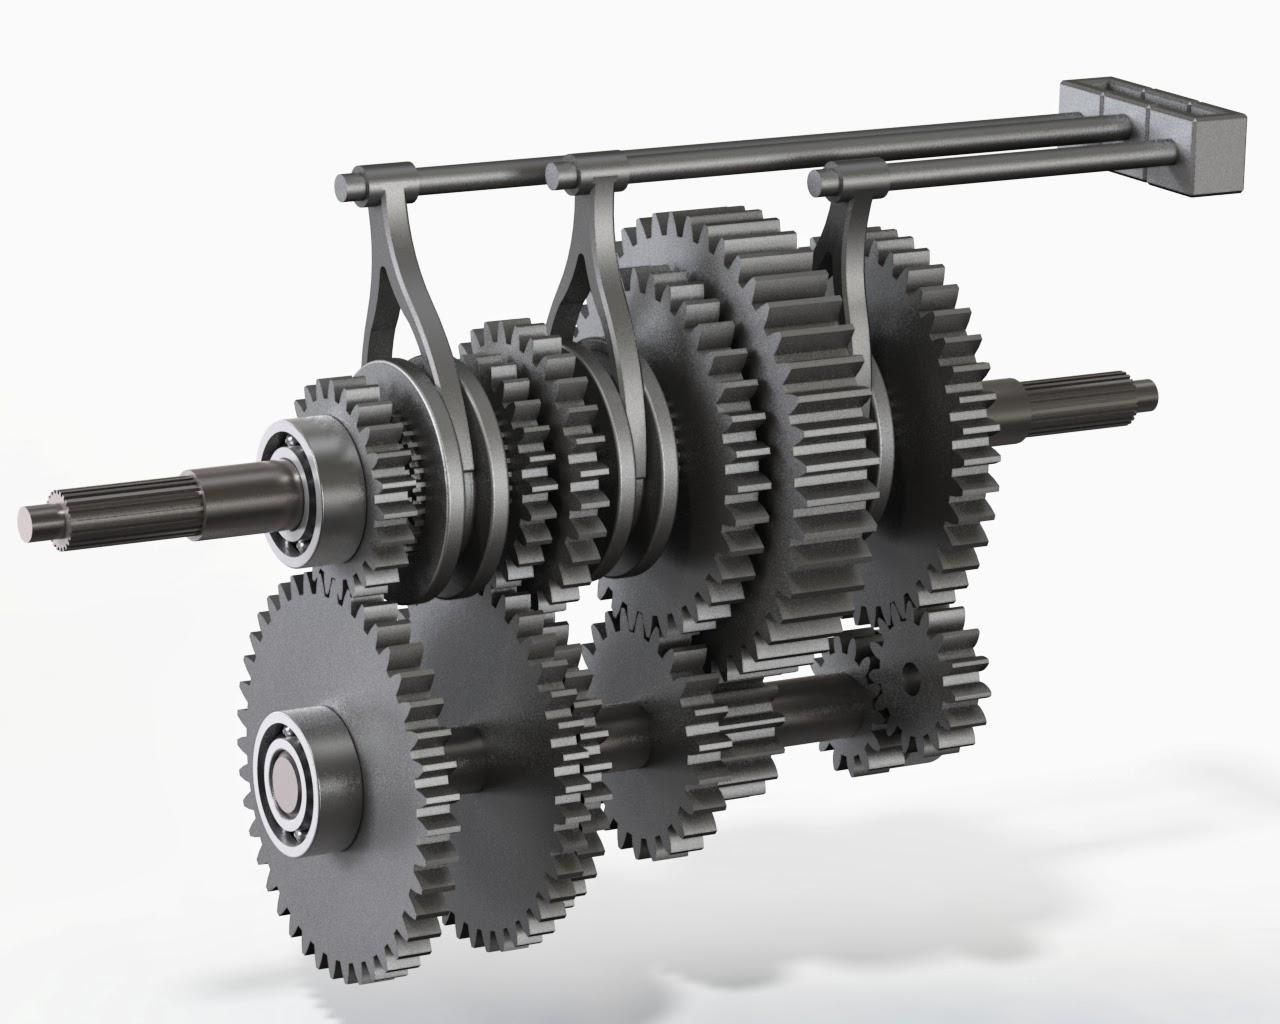 Figure 1: 3D Model.